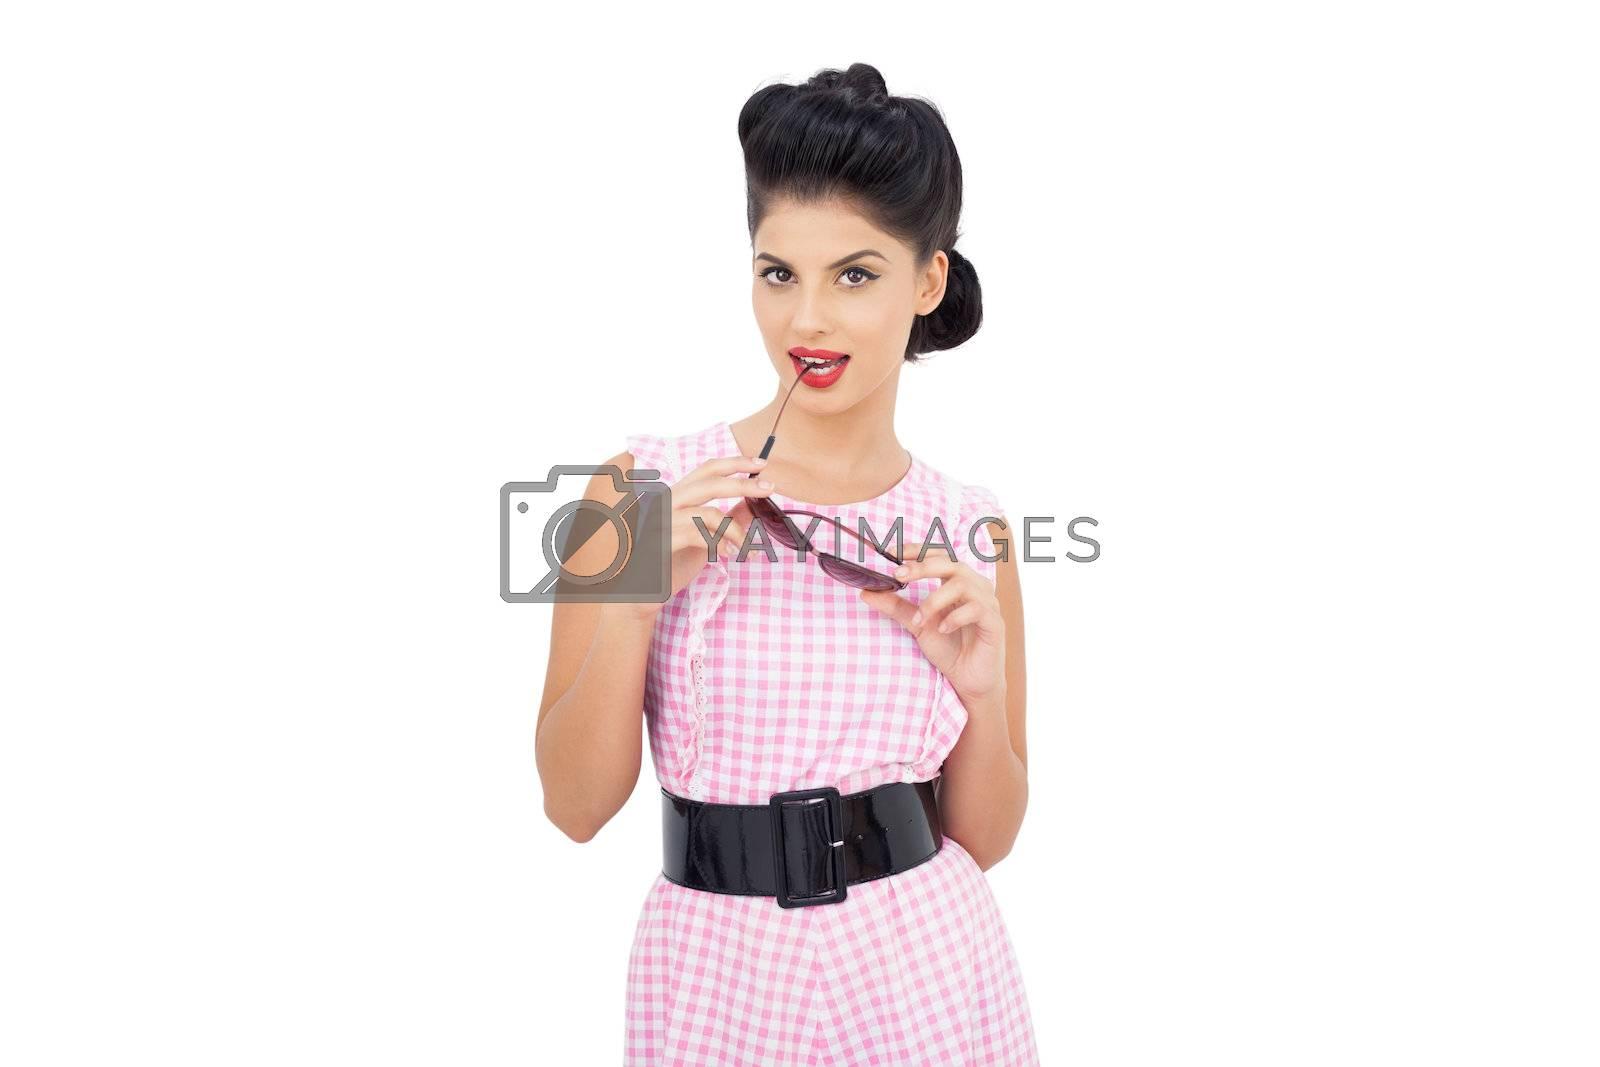 Seductive black hair model chewing her sunglasses by Wavebreakmedia